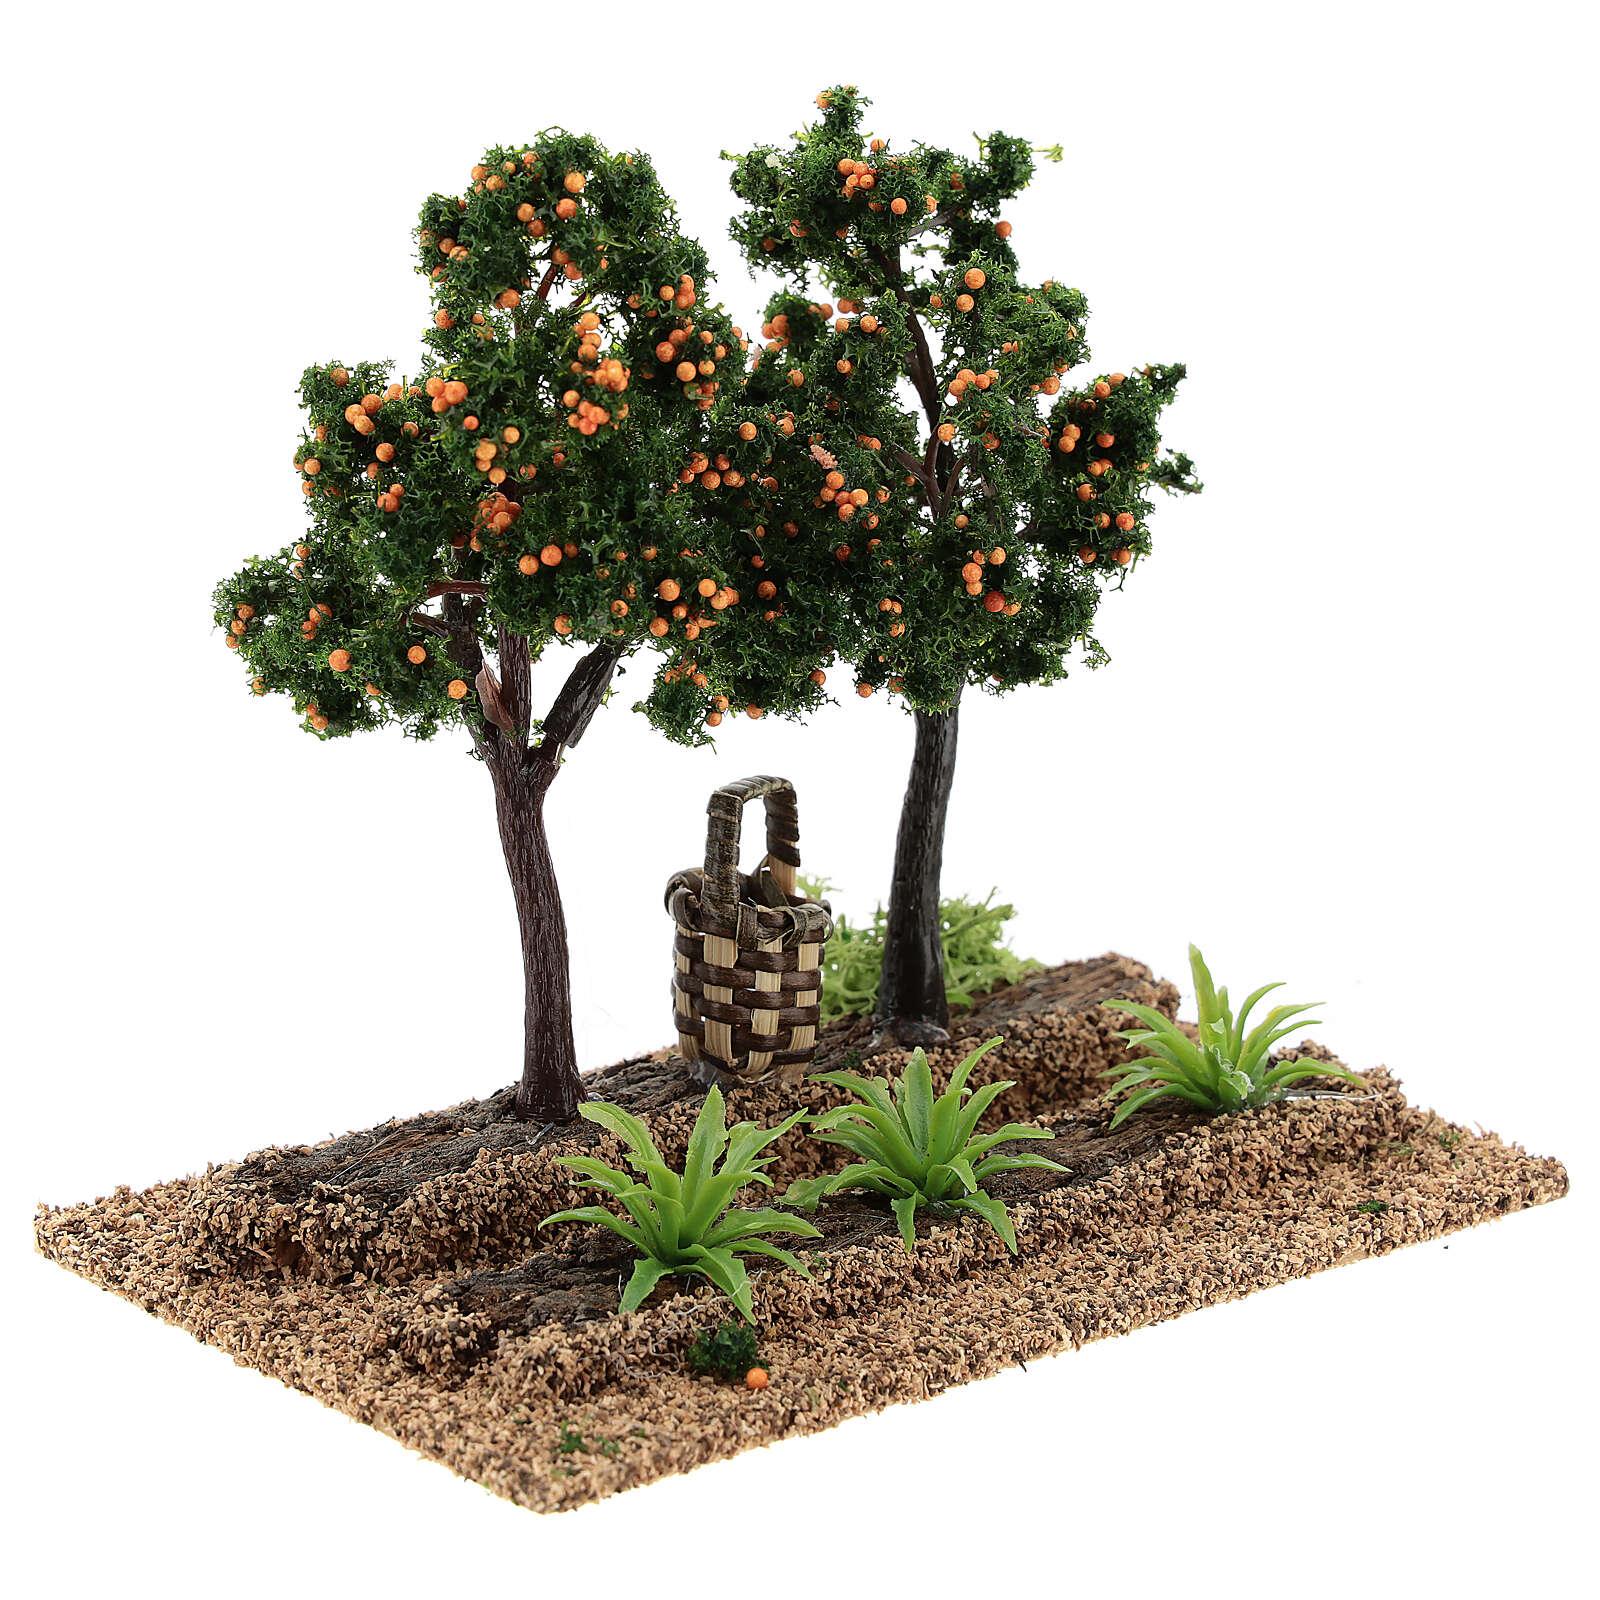 Frutteto arance 15x15x10 cm presepi 6-8 cm 4